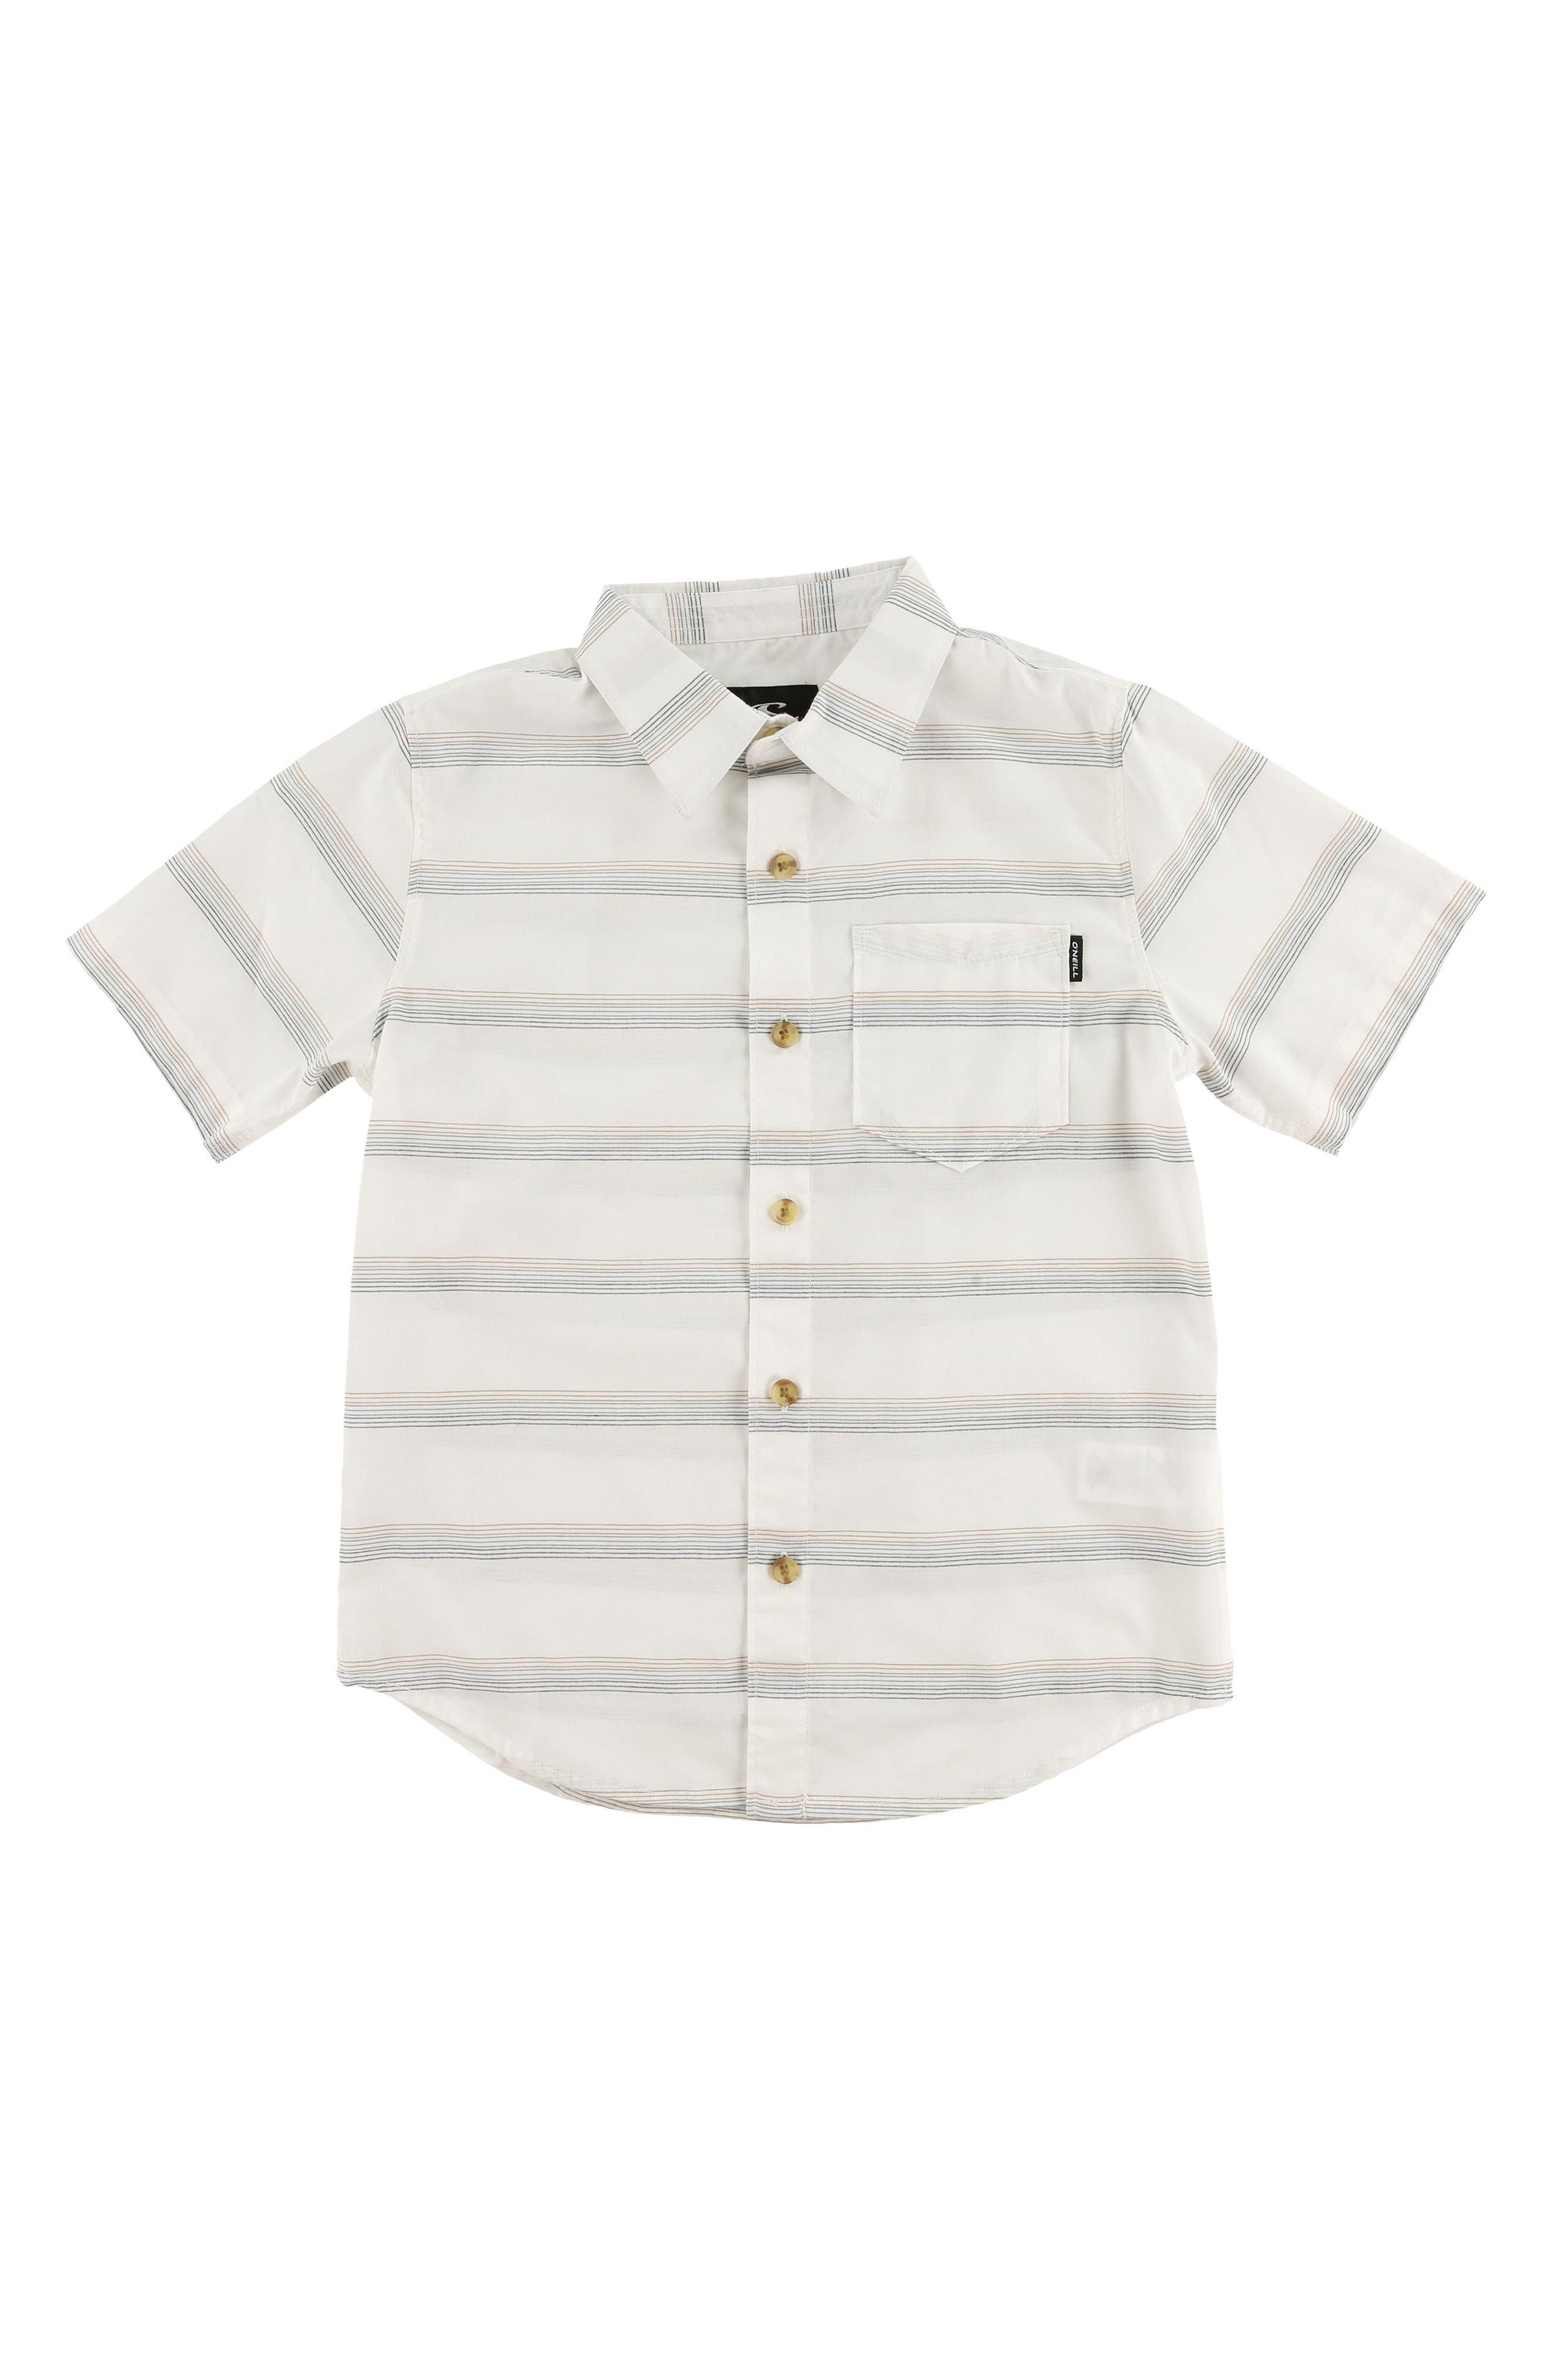 Pickett Woven Shirt,                         Main,                         color, White